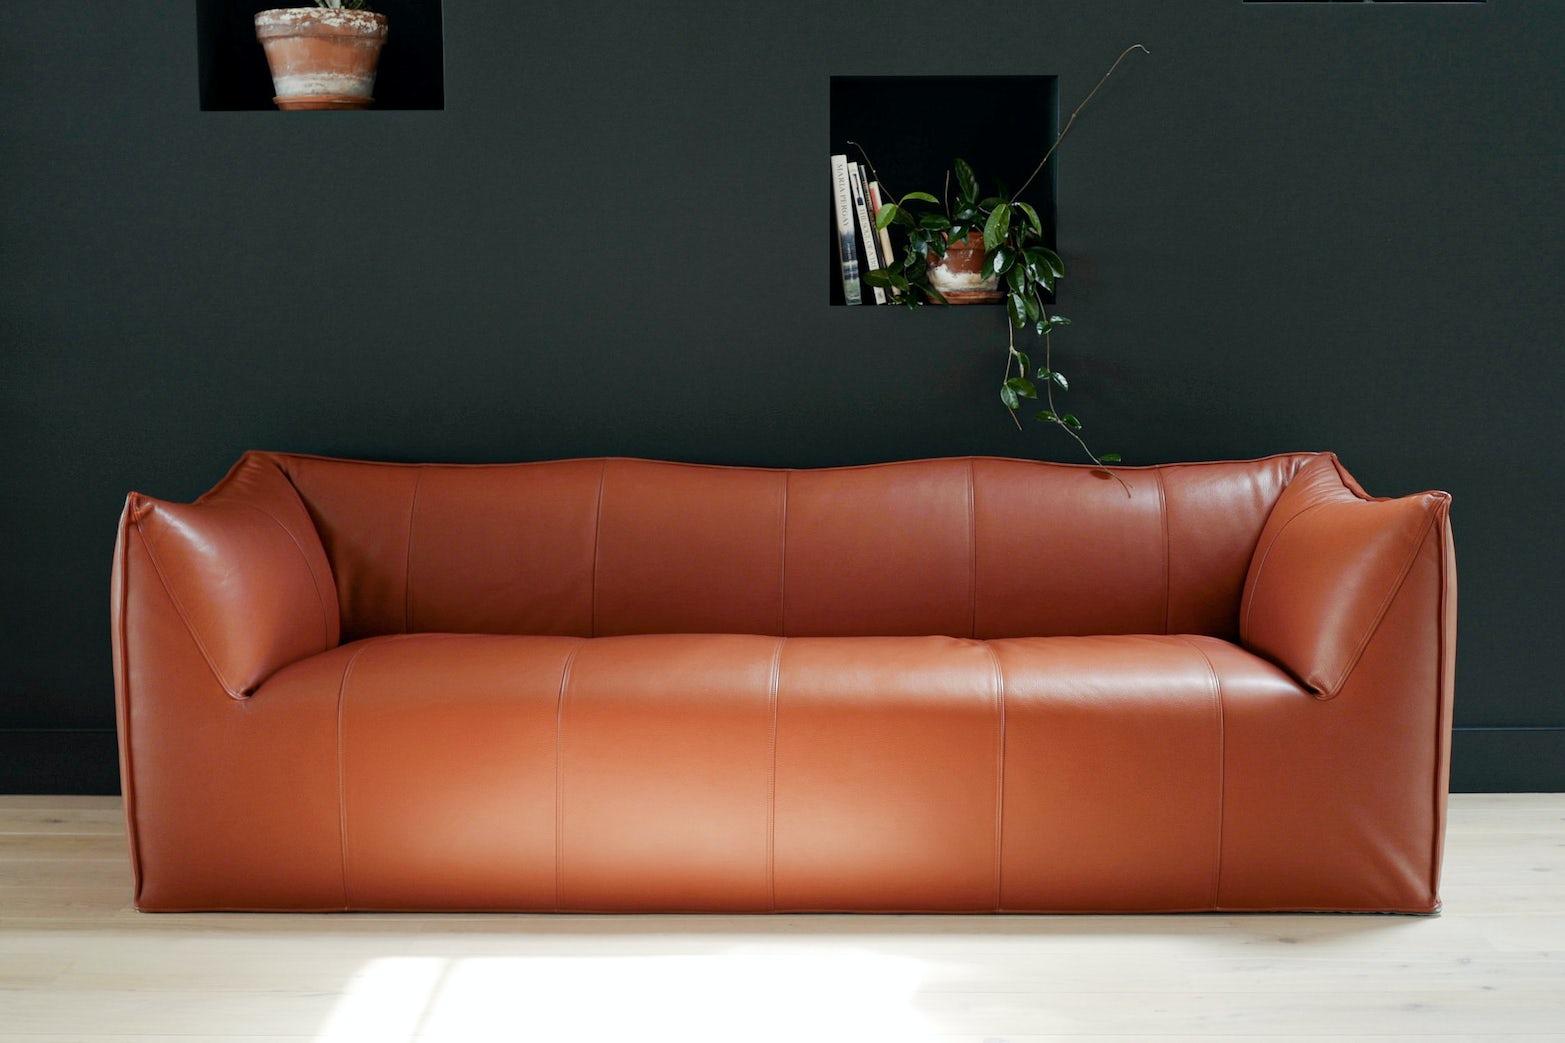 Bambole sofa